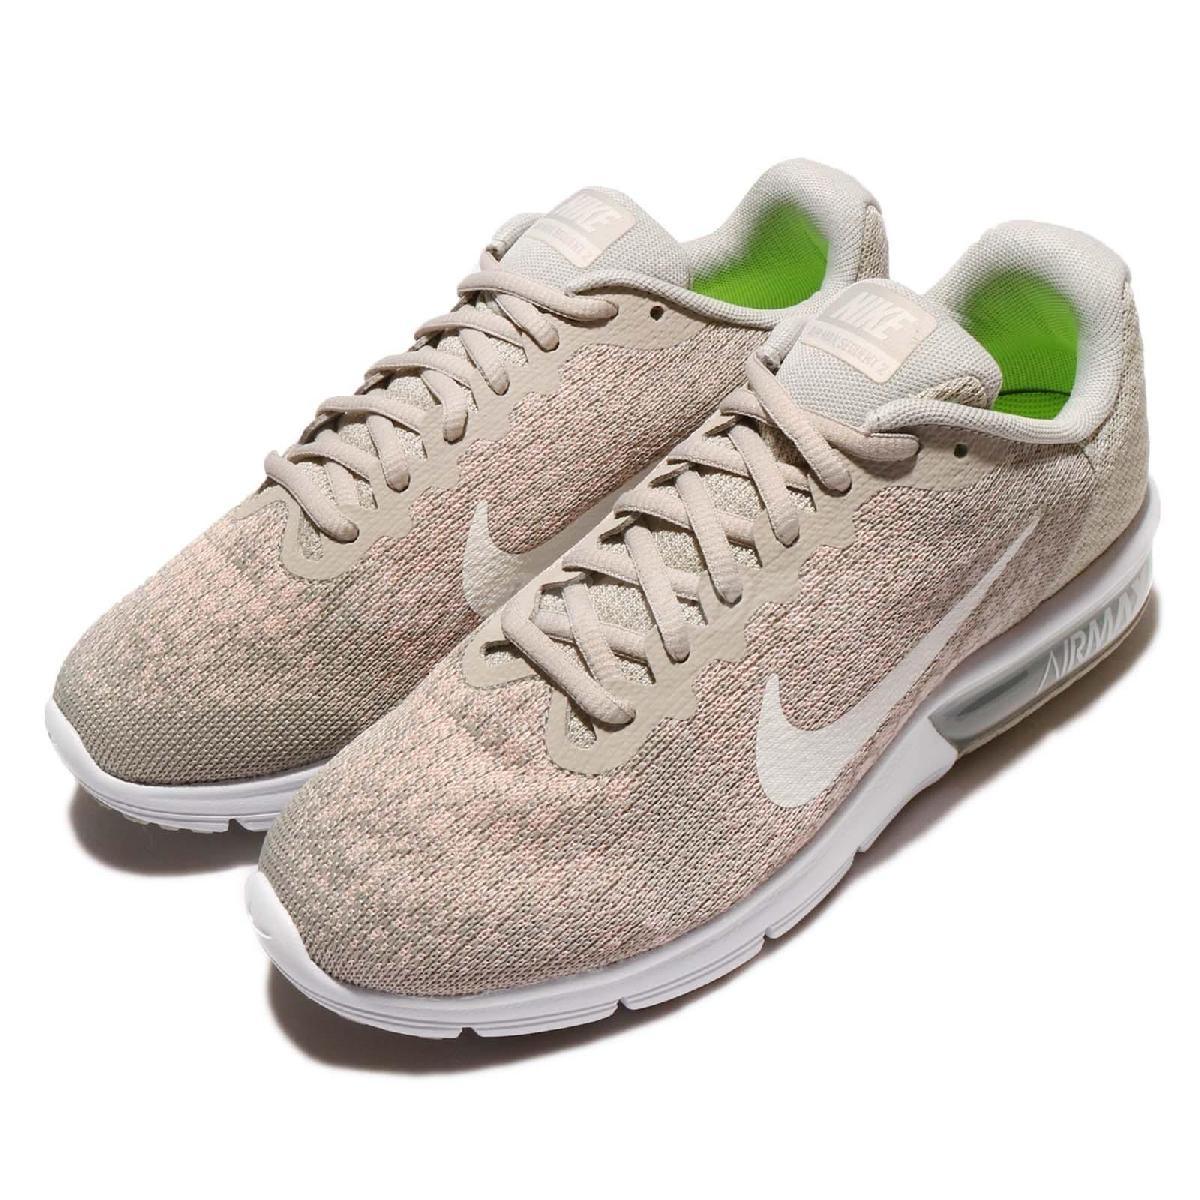 Nike慢跑鞋Wmns Air Max Sequent灰卡其白底氣墊編織雪花鞋面女鞋PUMP306 852465-011